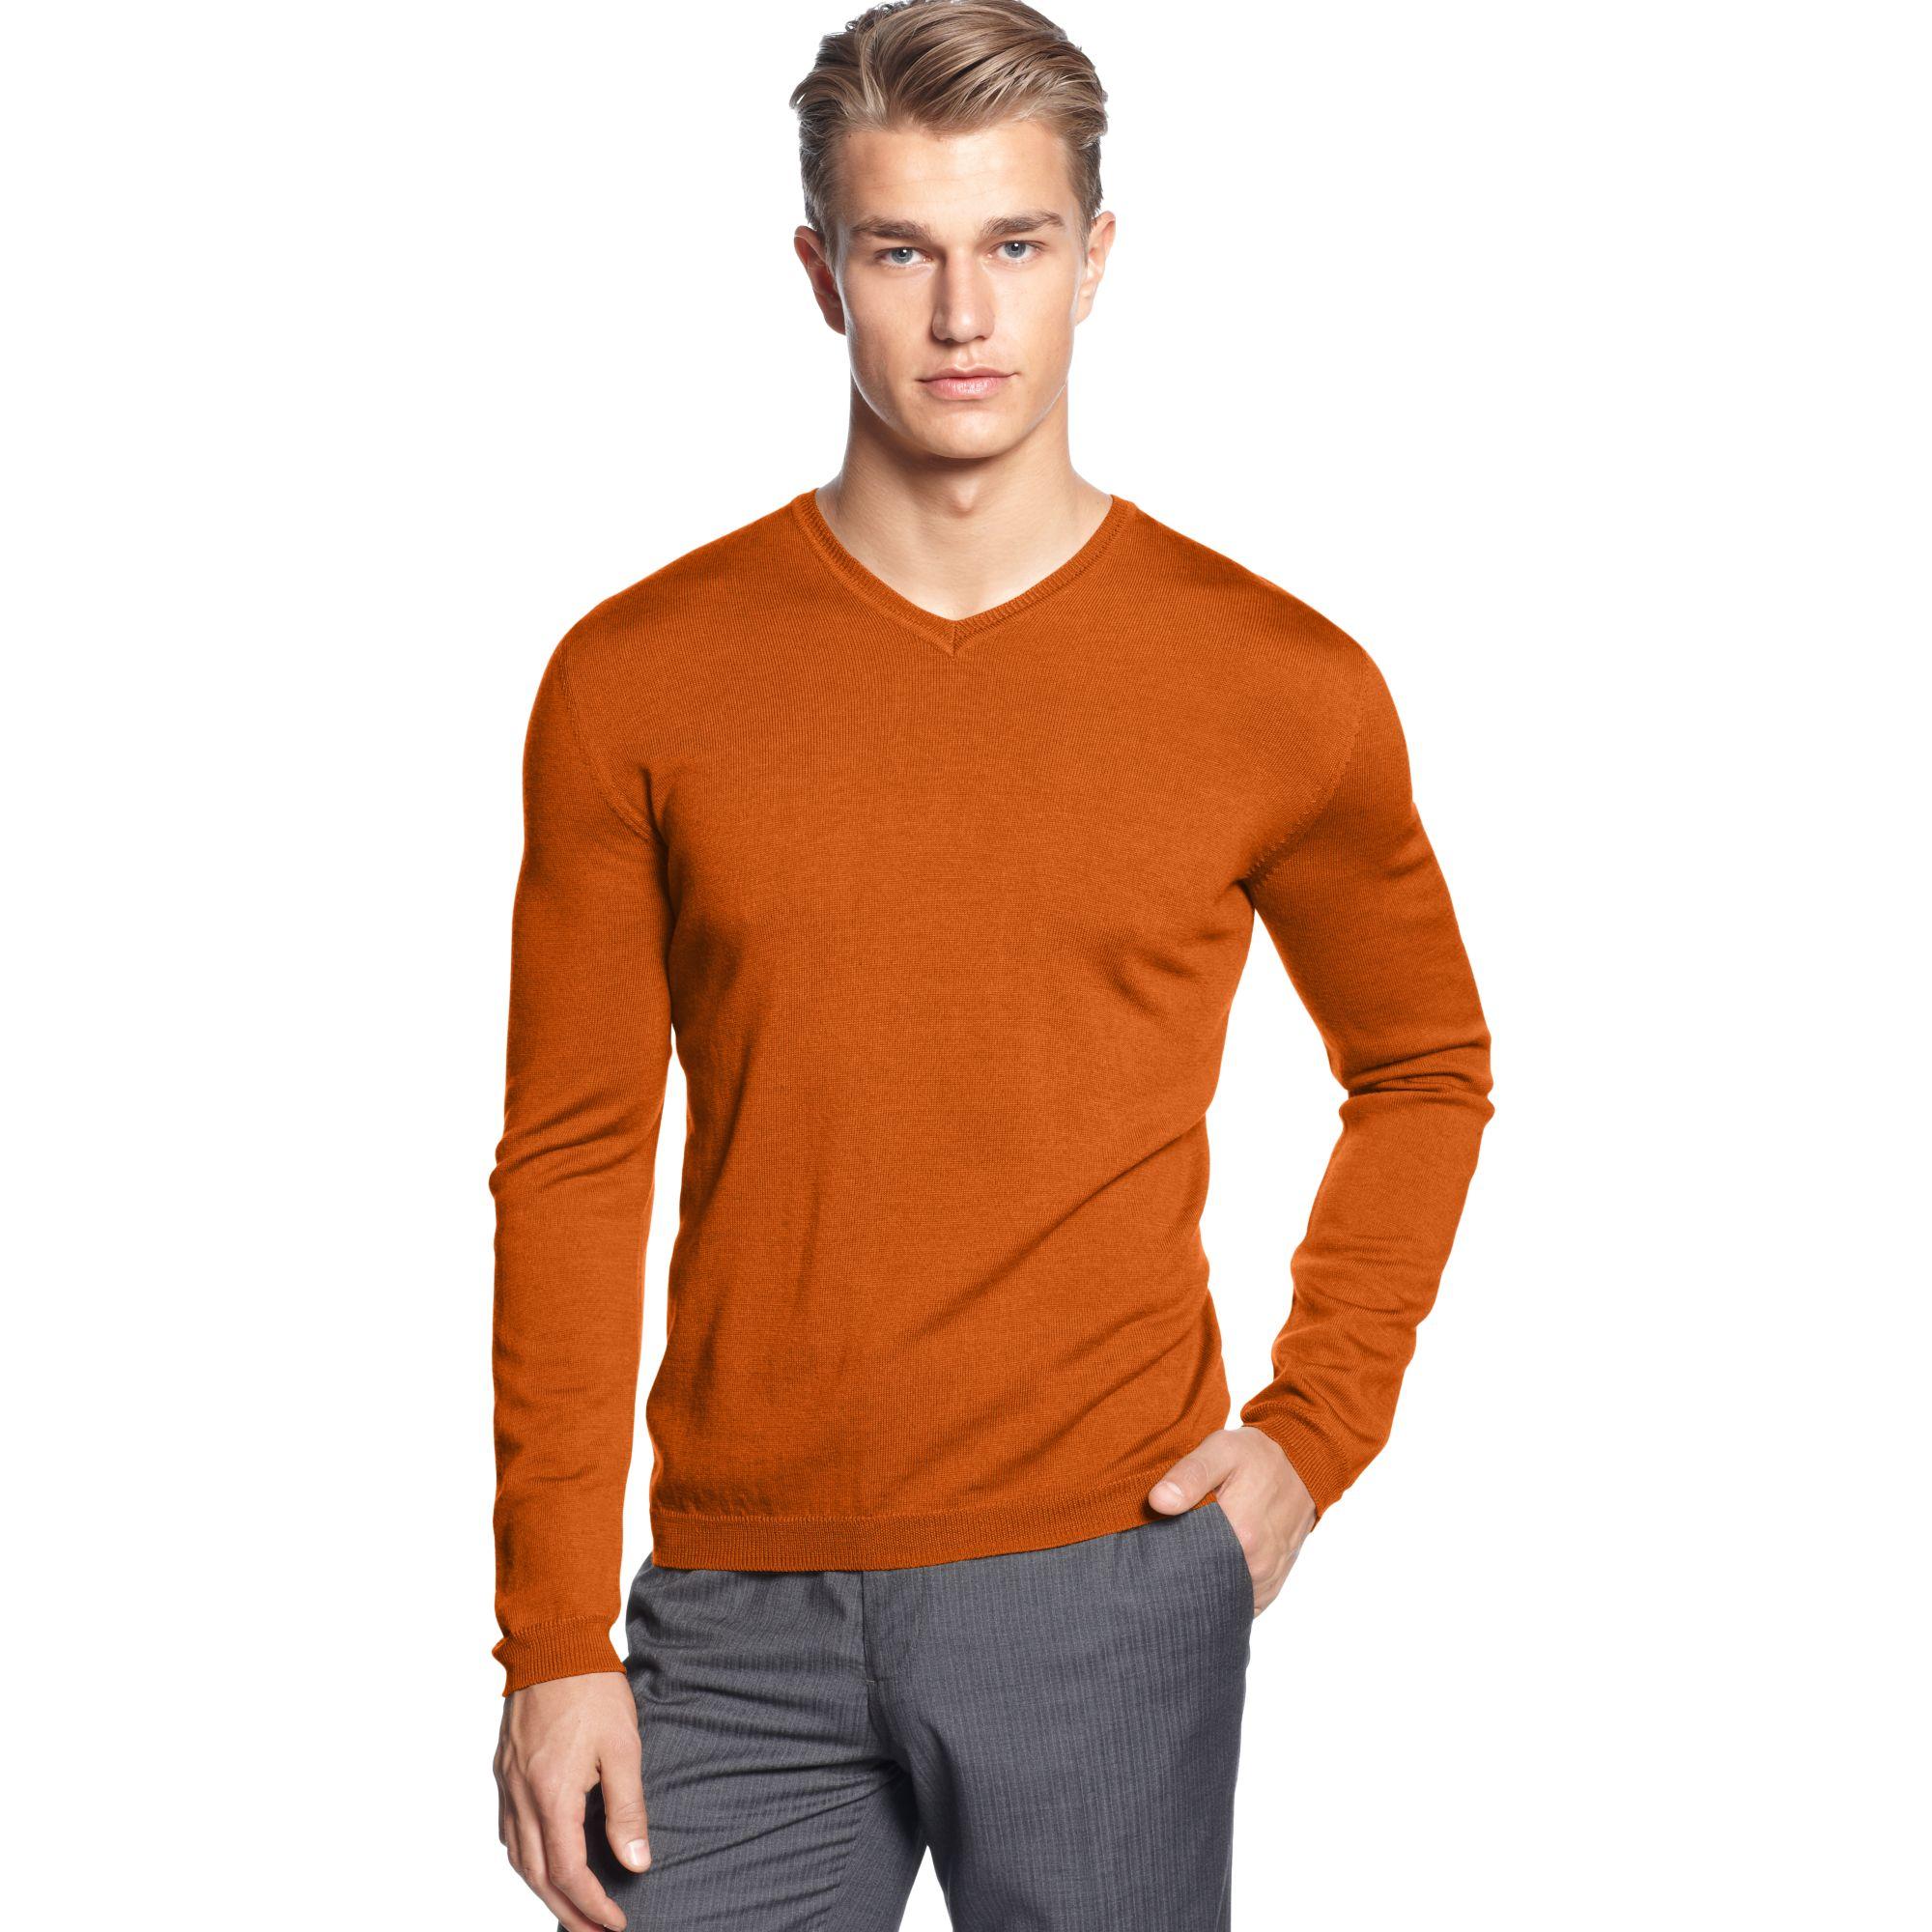 lyst calvin klein solid merino v neck sweater in orange. Black Bedroom Furniture Sets. Home Design Ideas